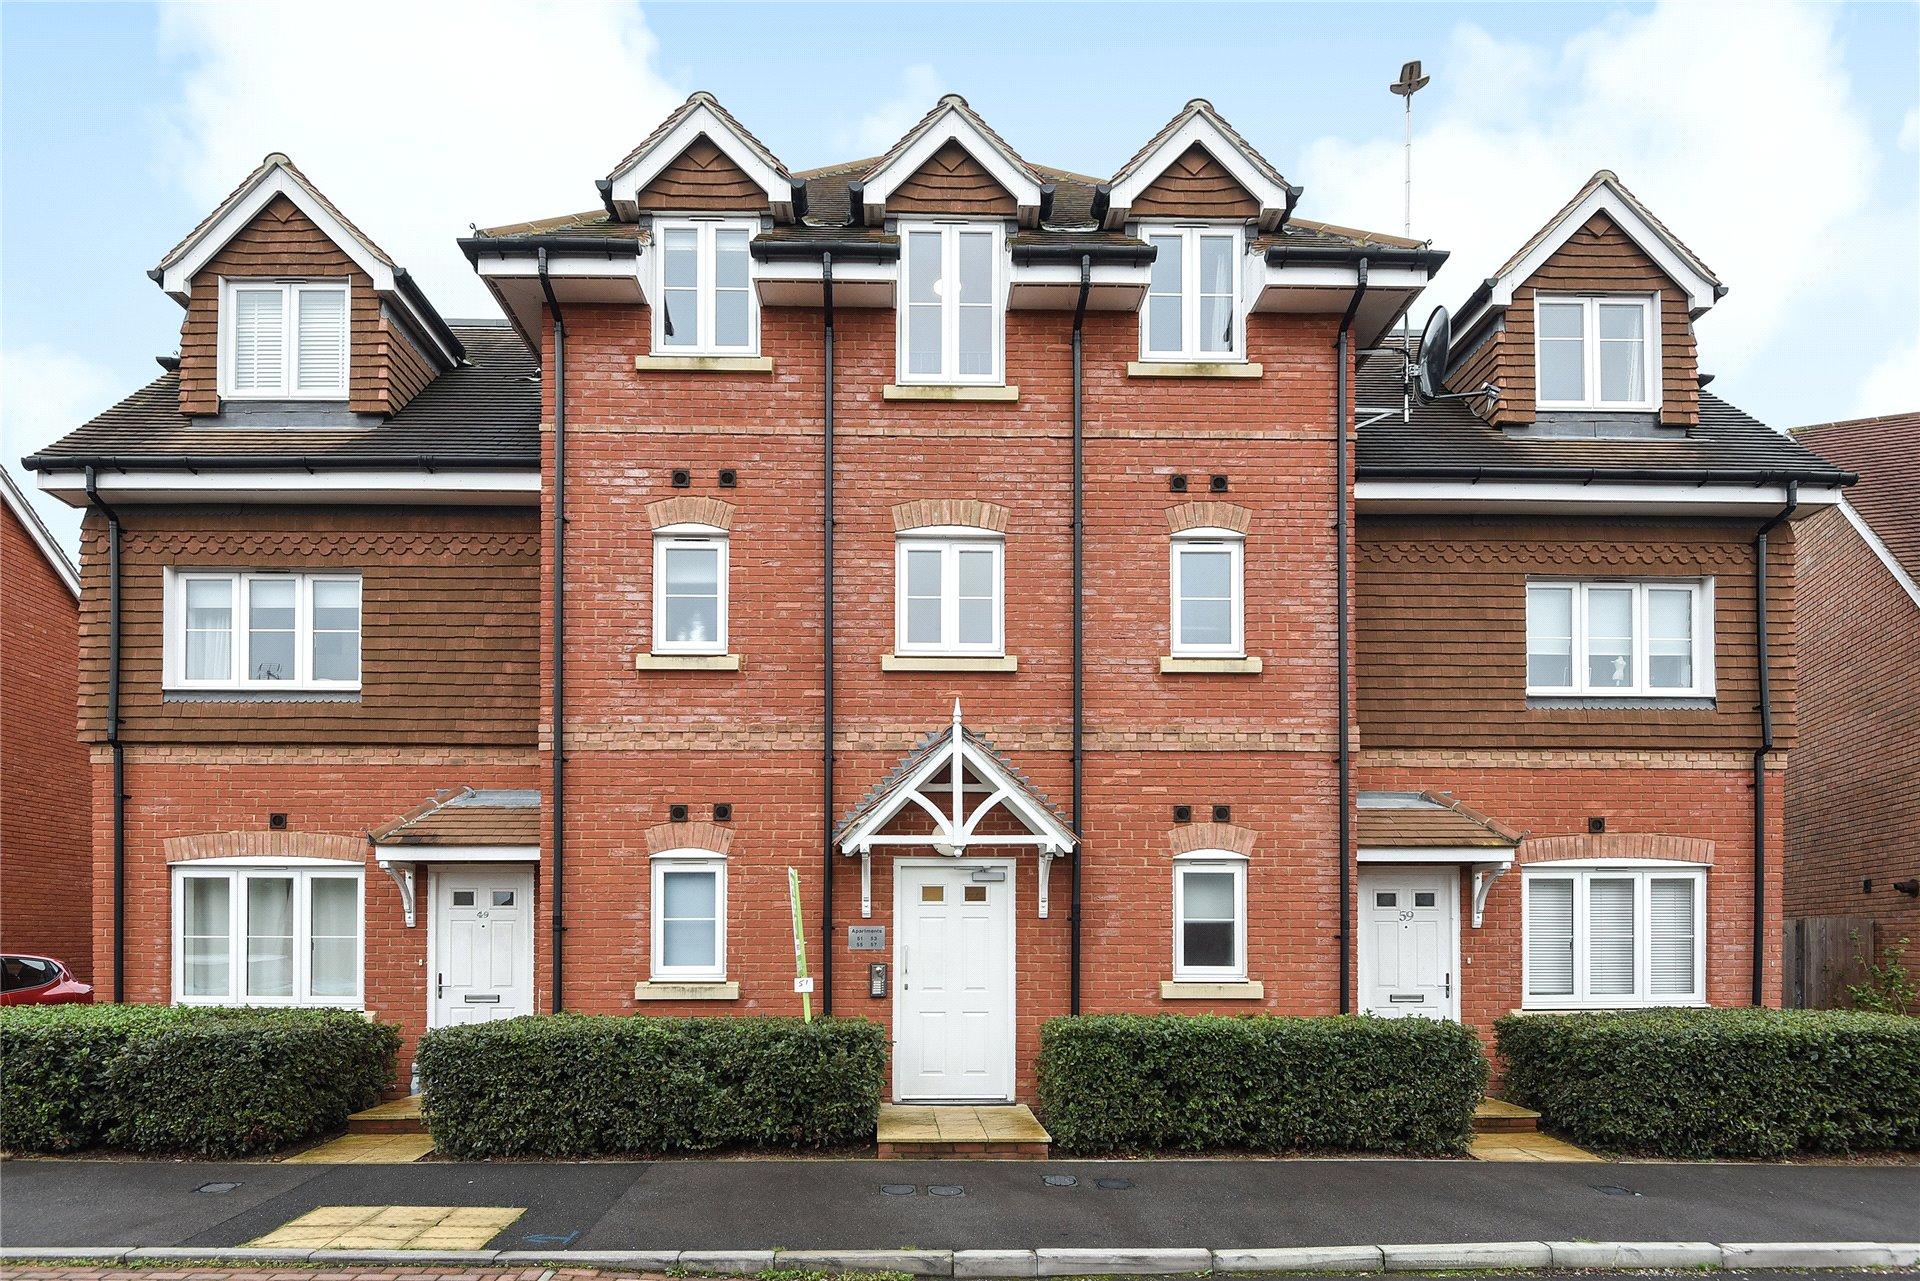 2 Bedrooms Apartment Flat for sale in Carina Drive, Wokingham, Berkshire, RG40